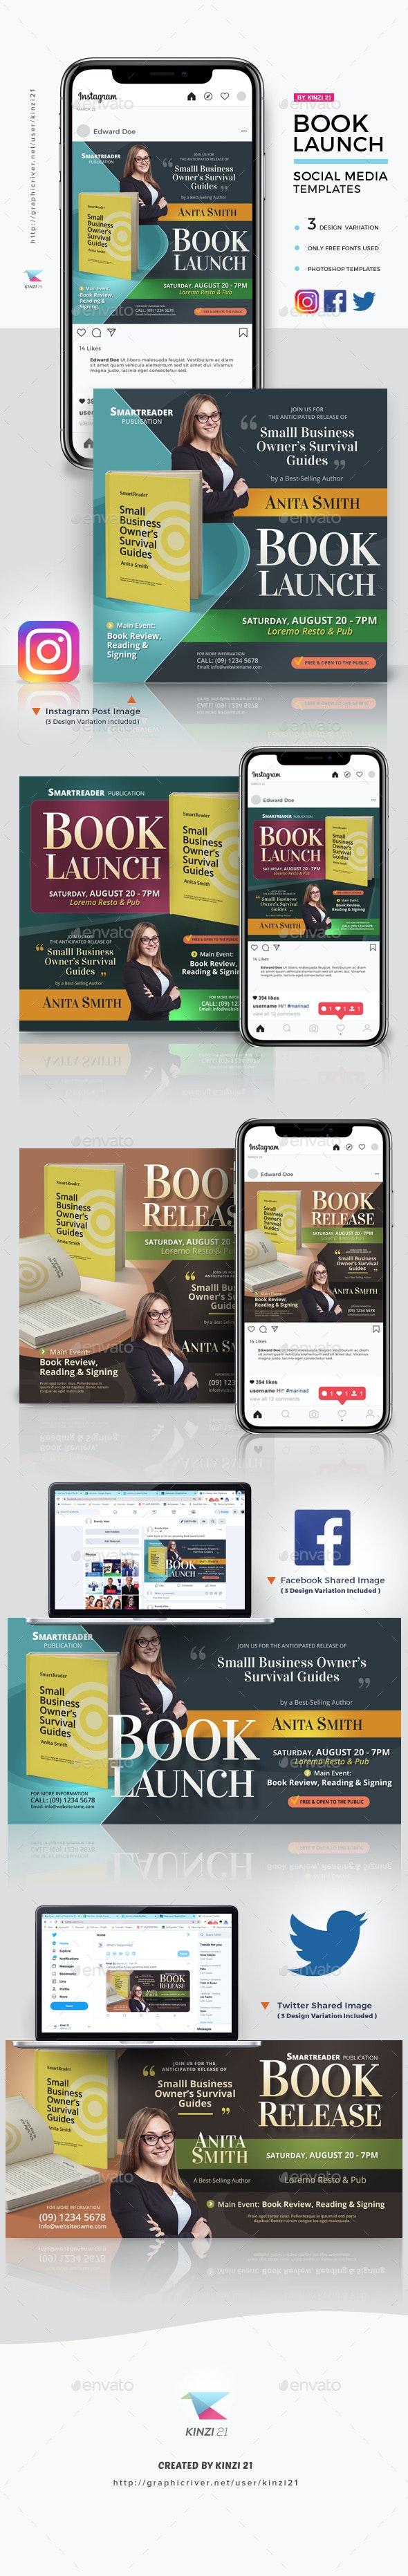 Book Launch Social Media Template Pack - Social Media Web Elements